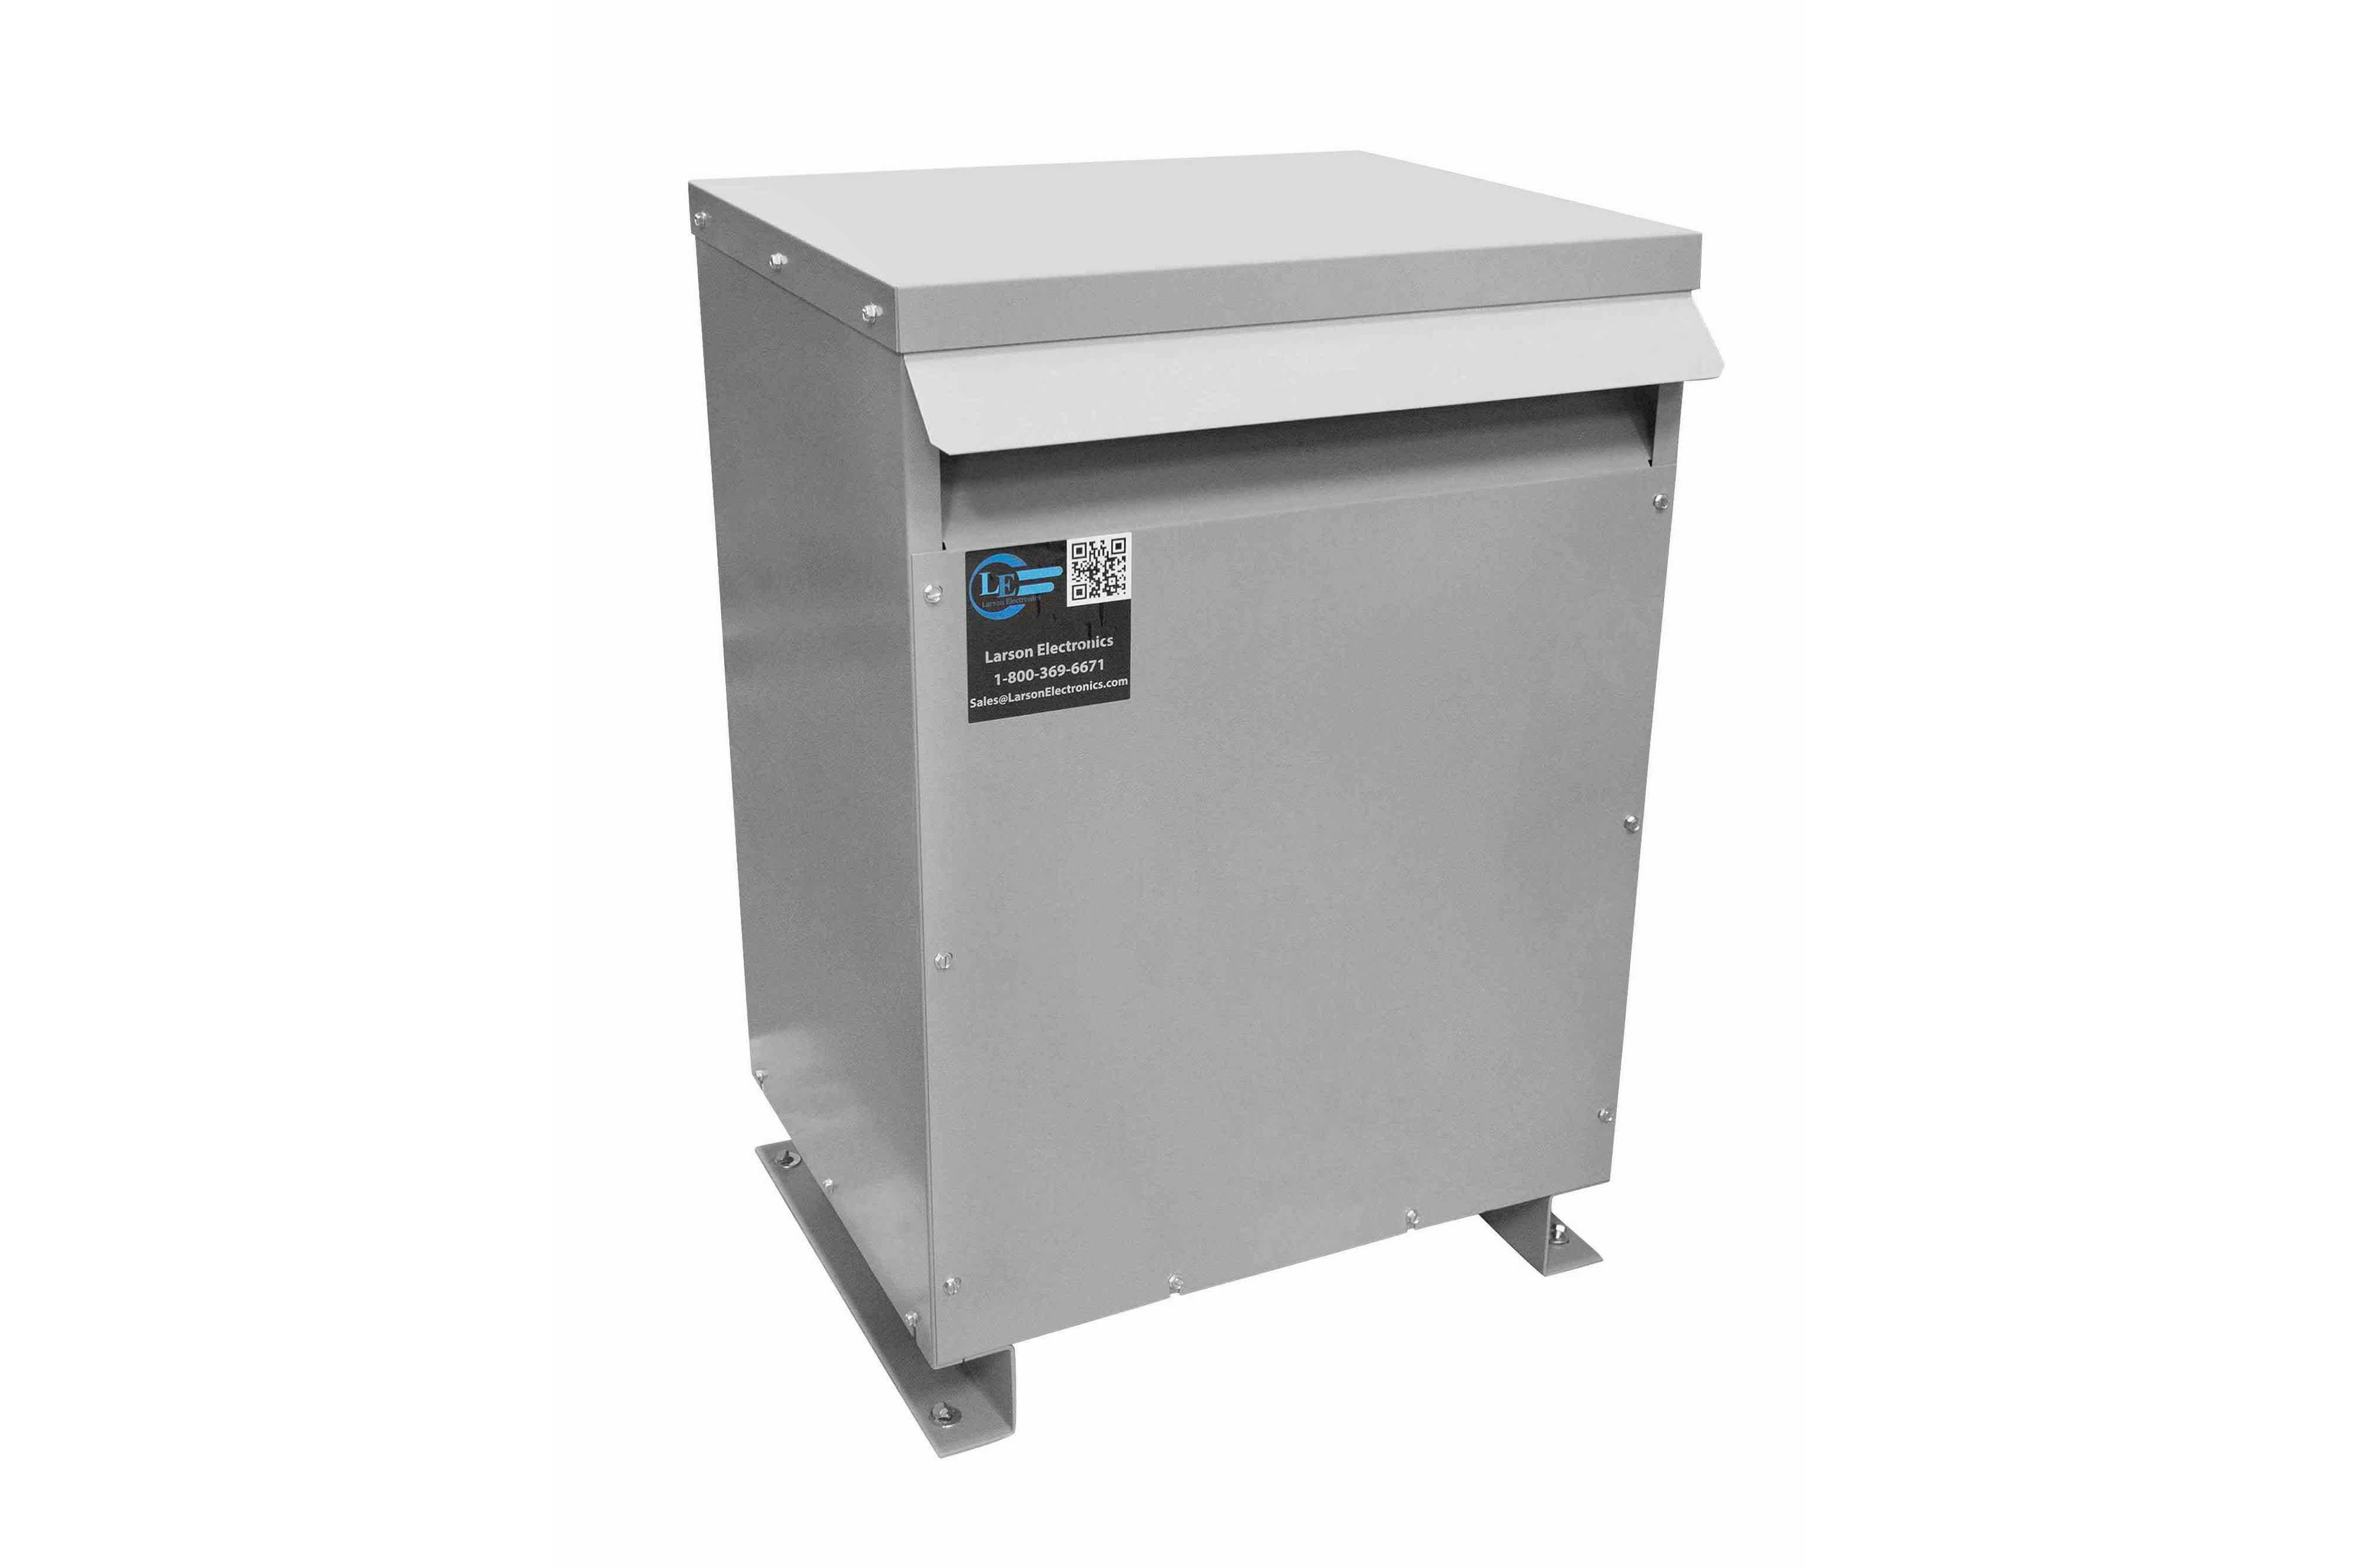 13 kVA 3PH Isolation Transformer, 208V Wye Primary, 208V Delta Secondary, N3R, Ventilated, 60 Hz